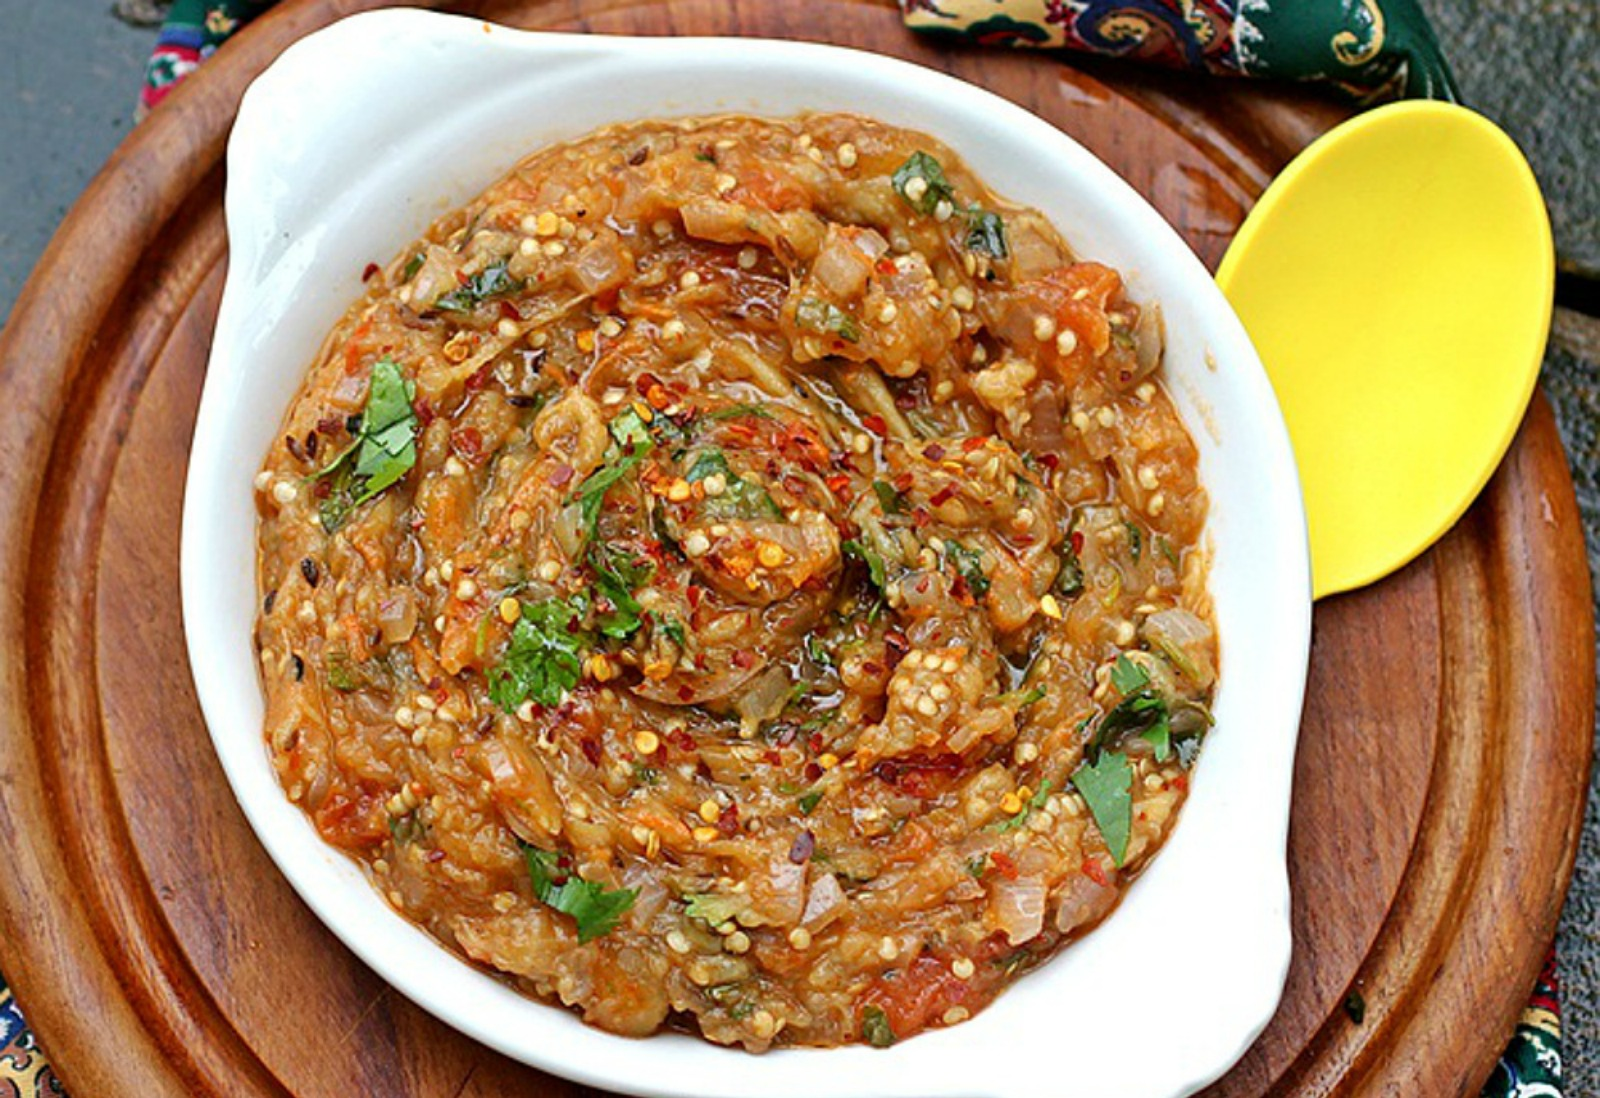 Indian-Baigan-Bharta-Char-Roasted-Eggplant-Dip-